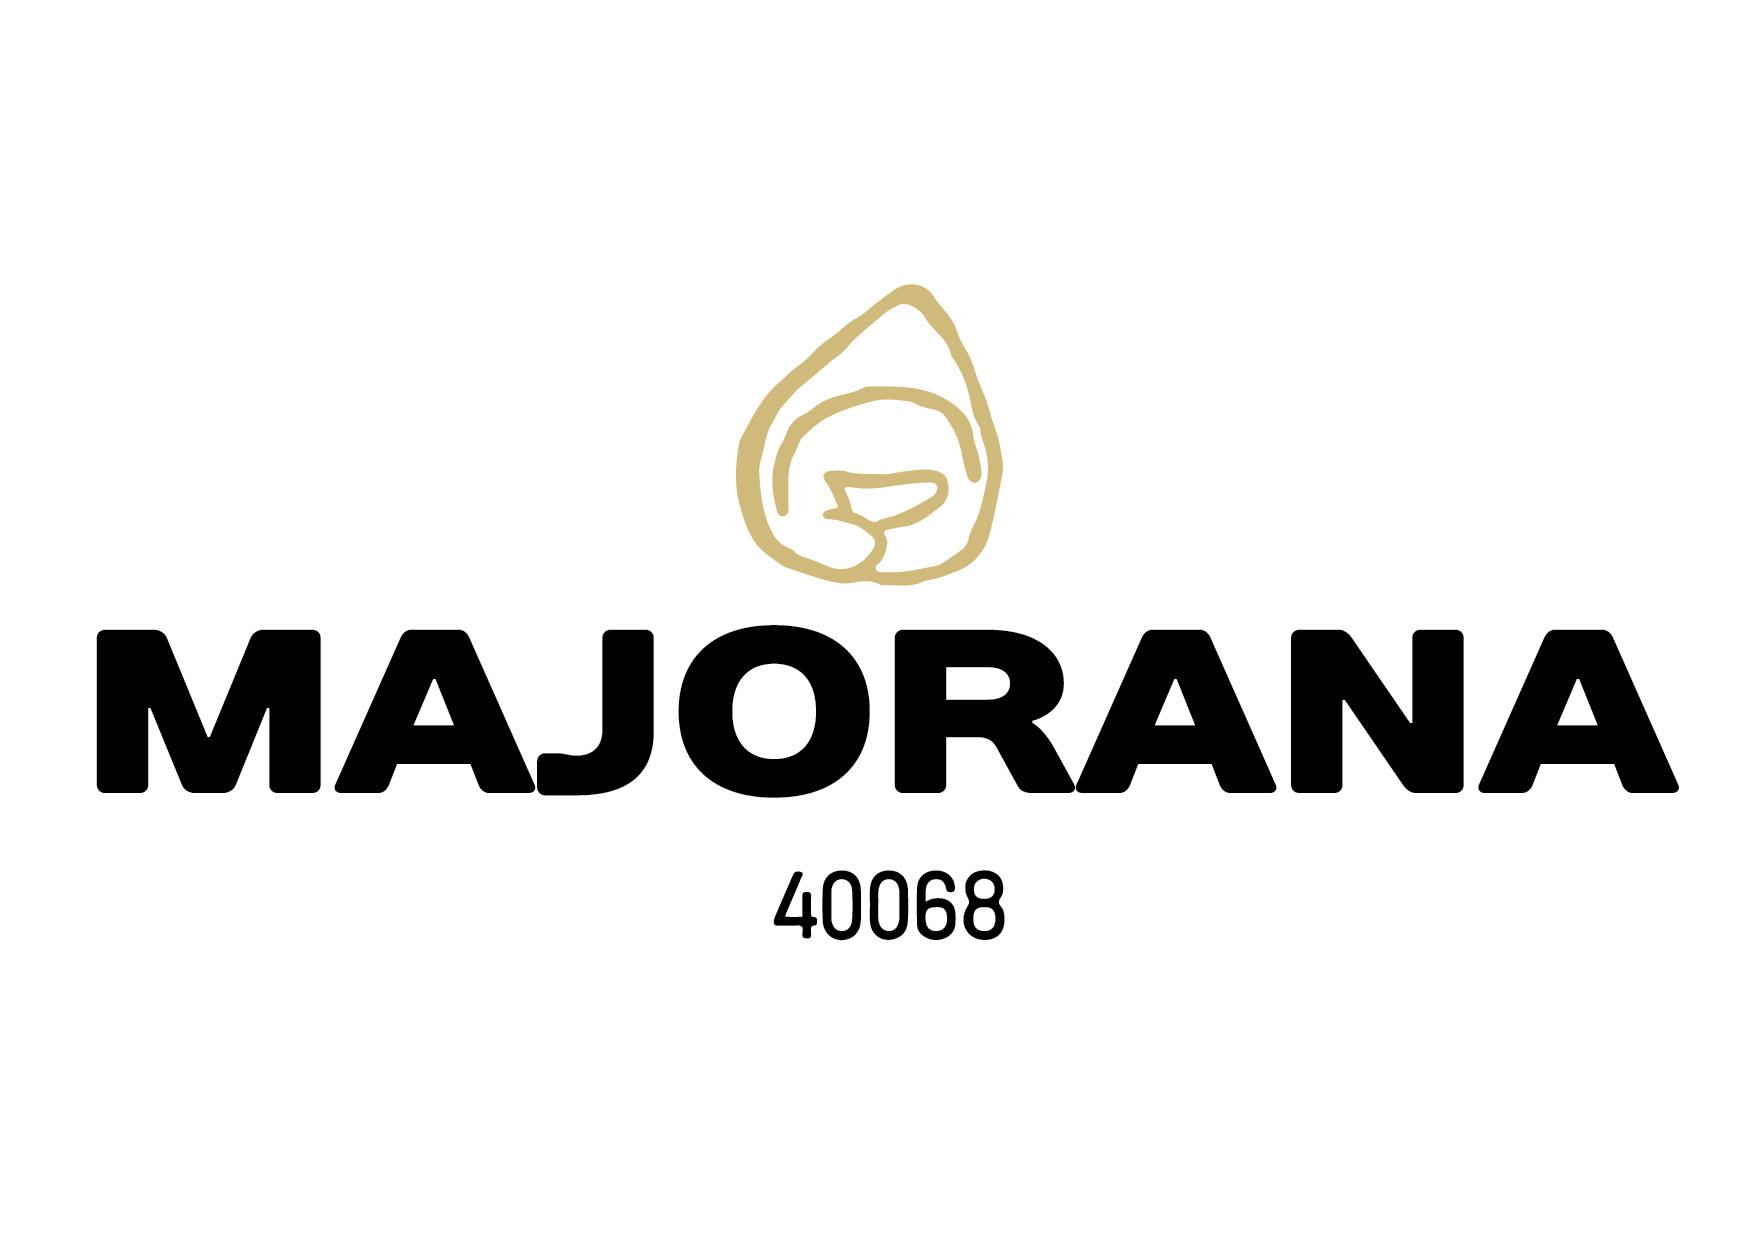 majorana_logo.jpg